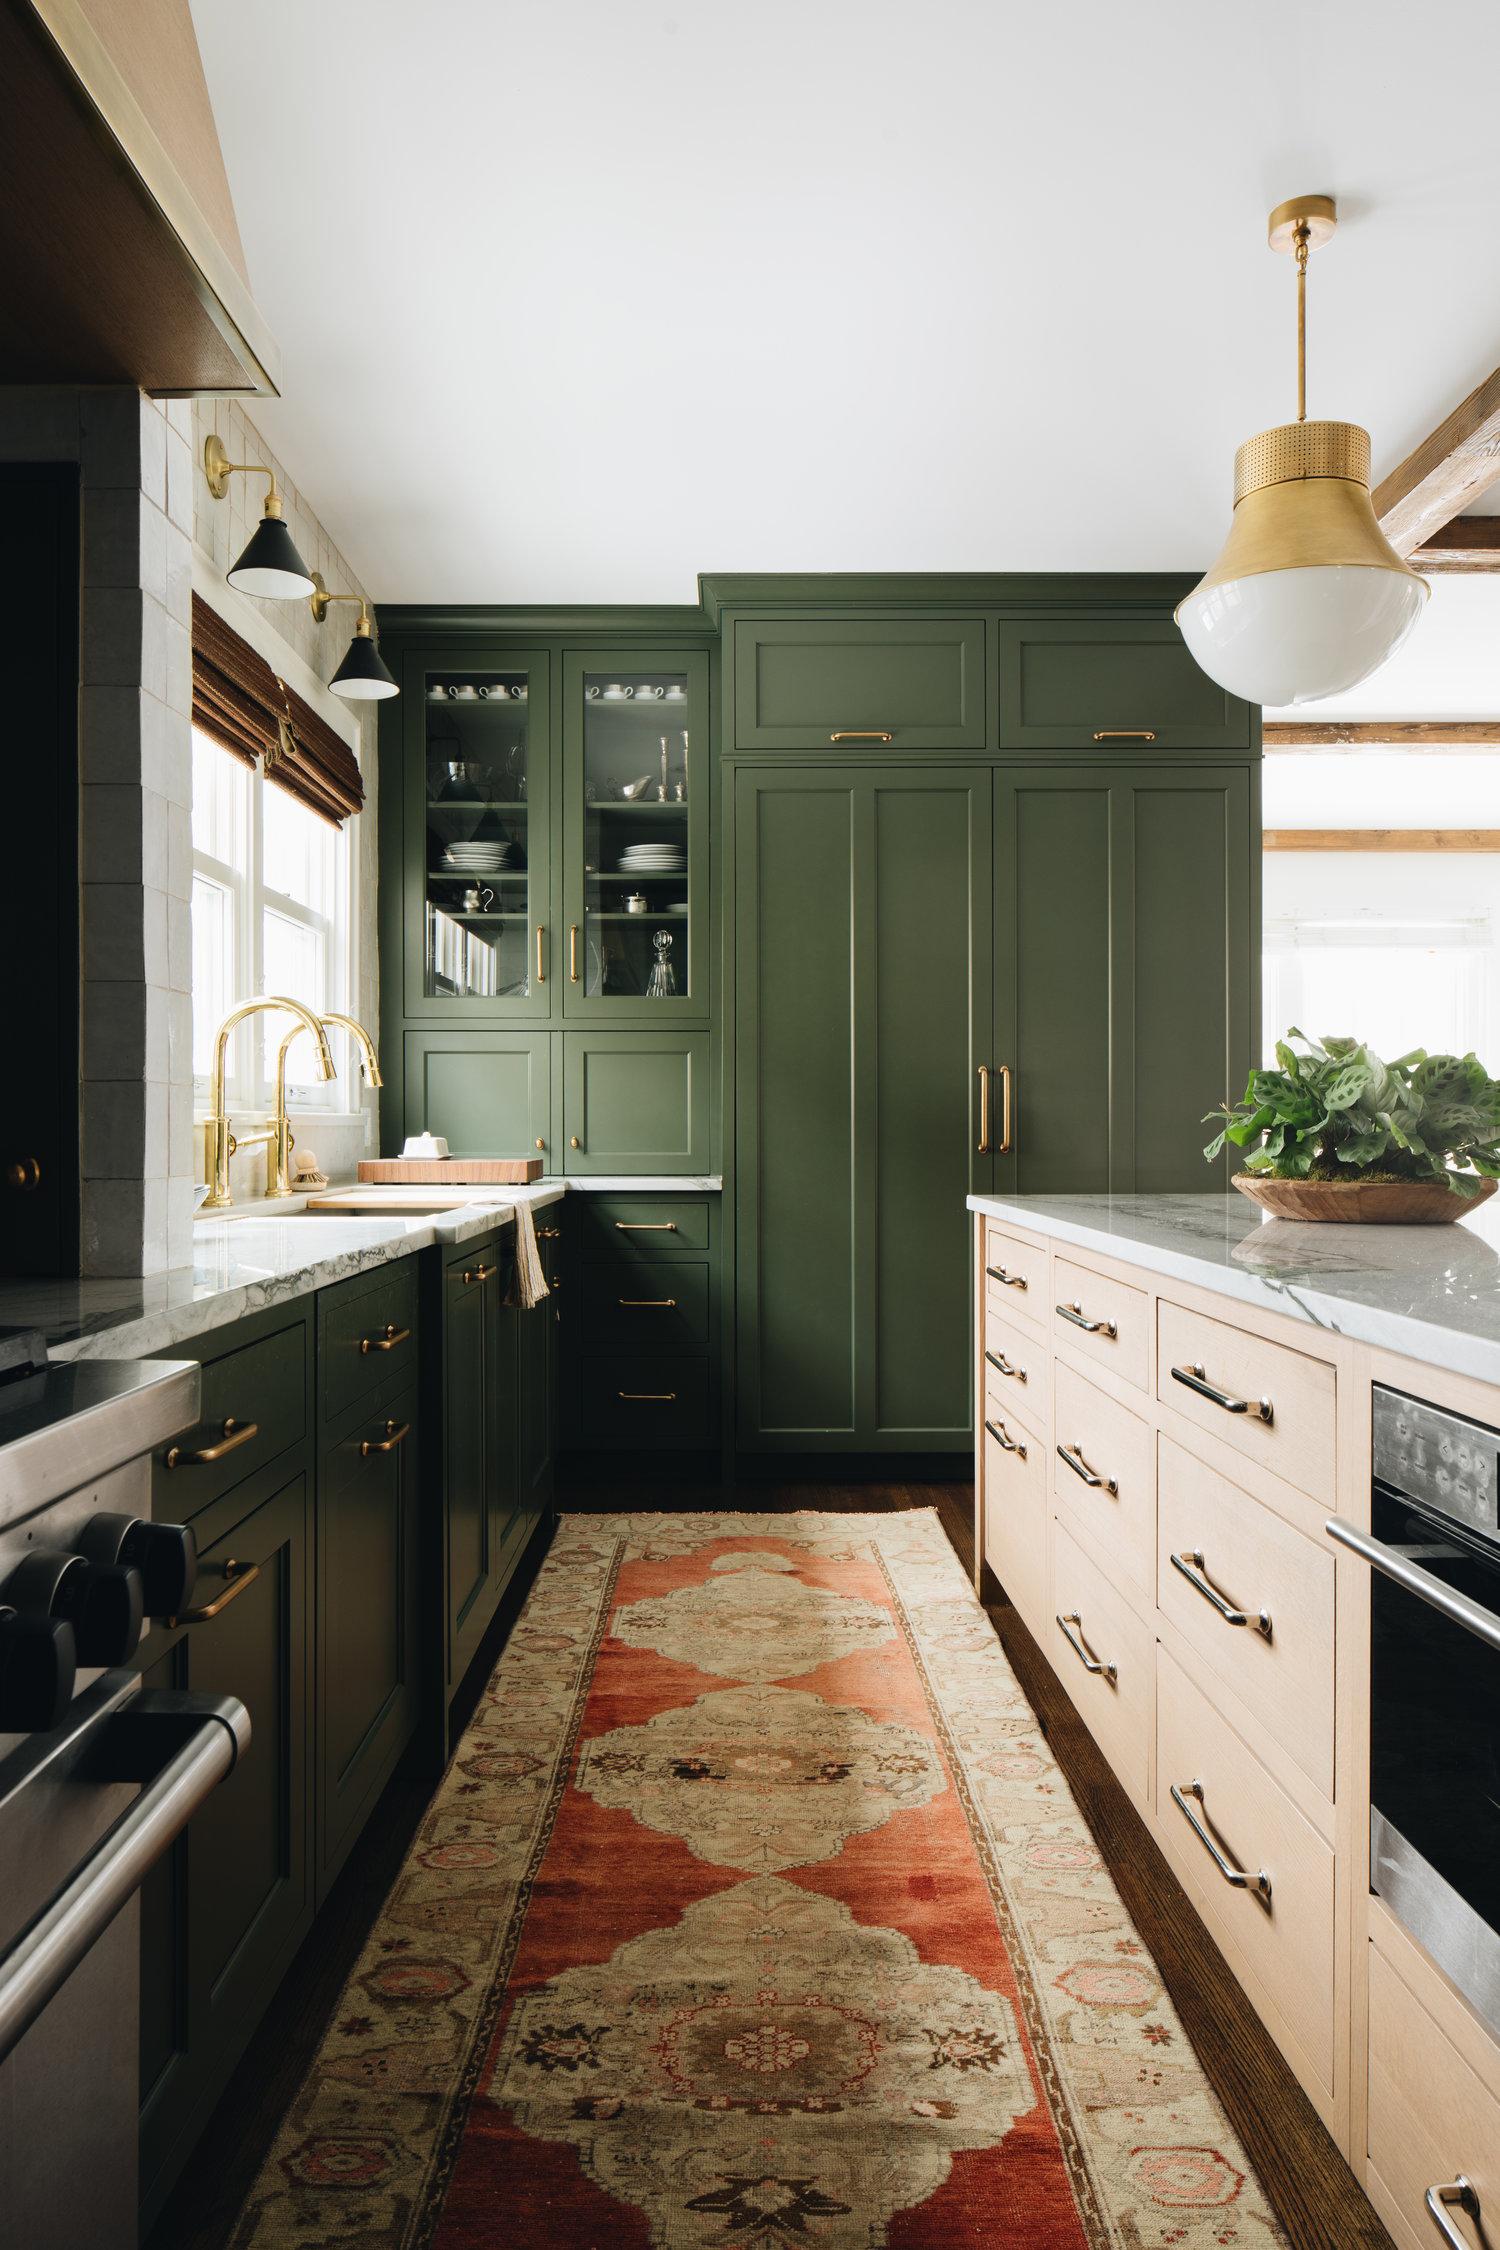 mixed metals in kitchen examples